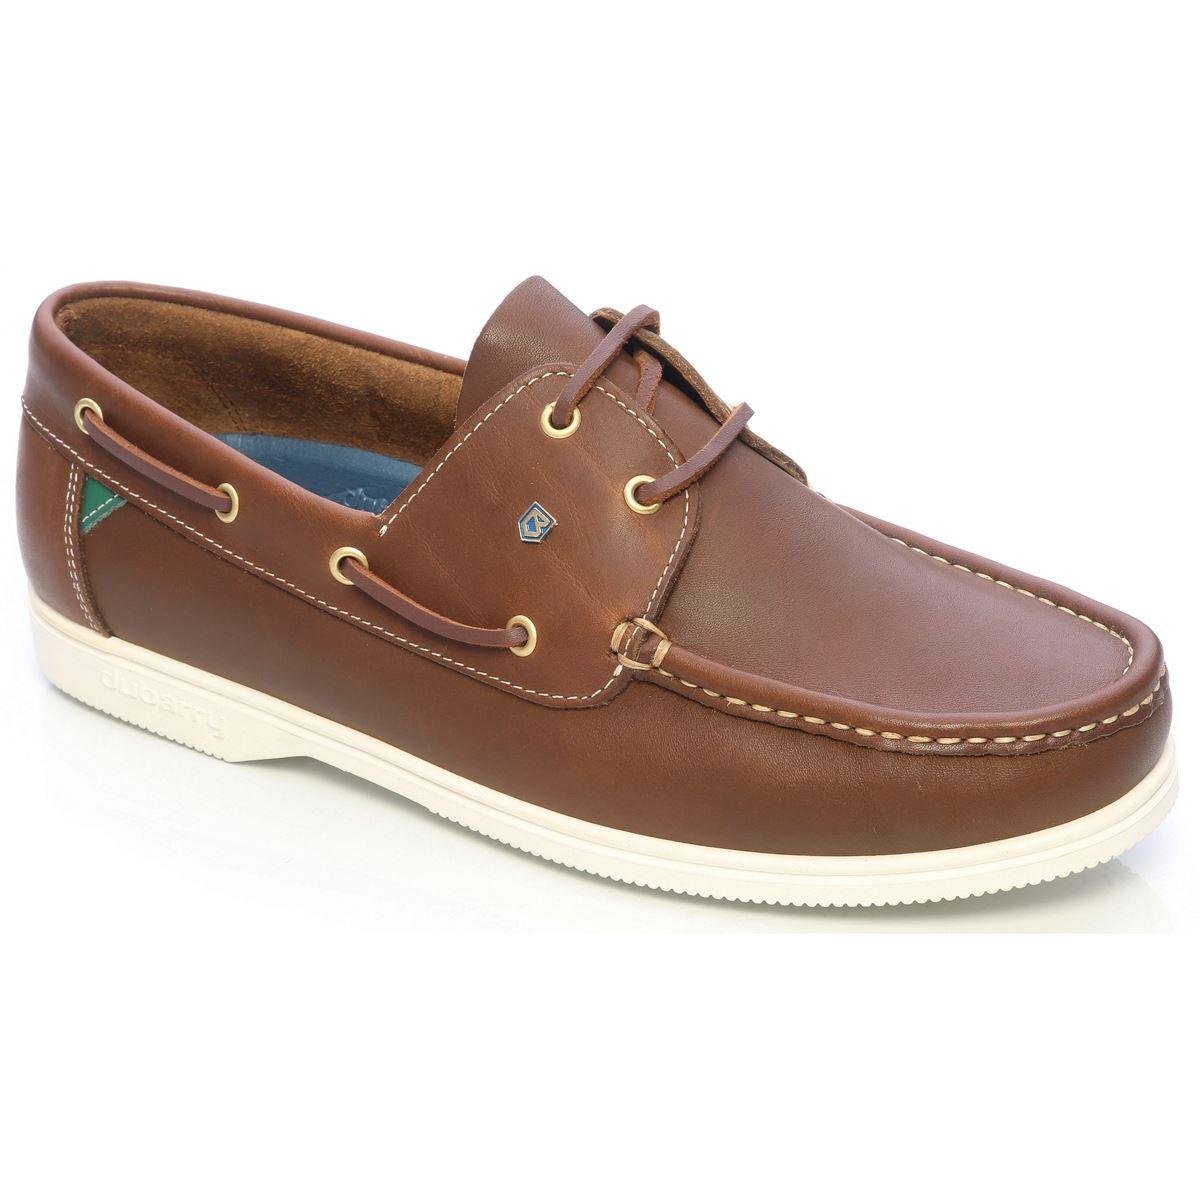 Dubarry Unisex Admirals Deck Shoe Brown 9 (EU43)